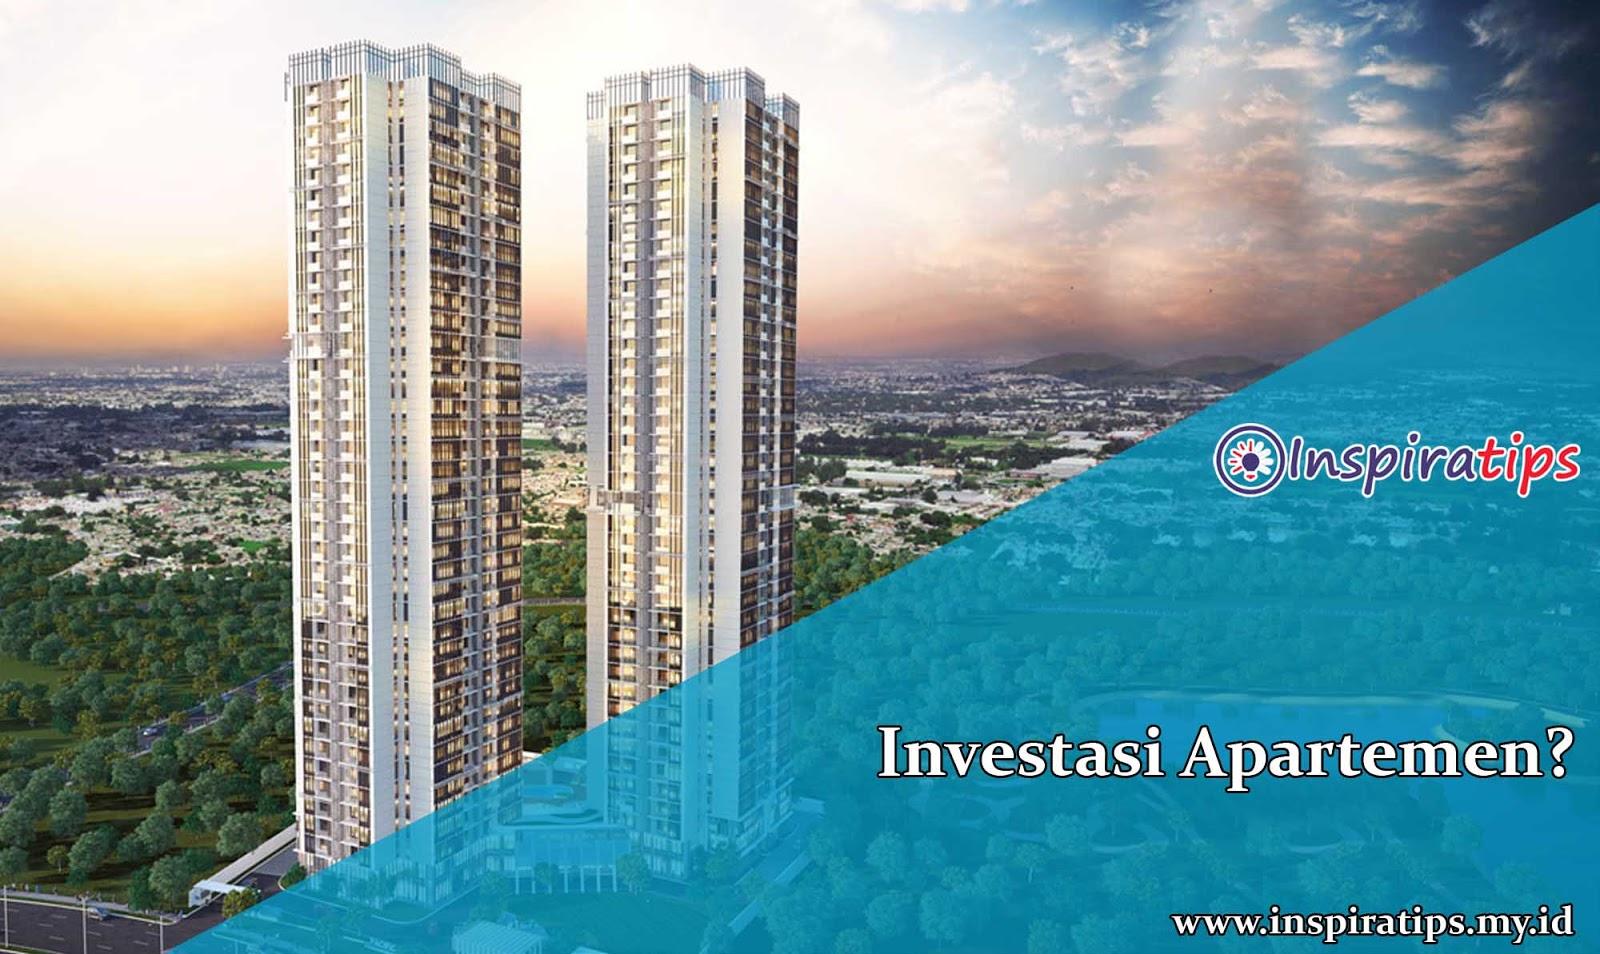 Investasi Apartemen